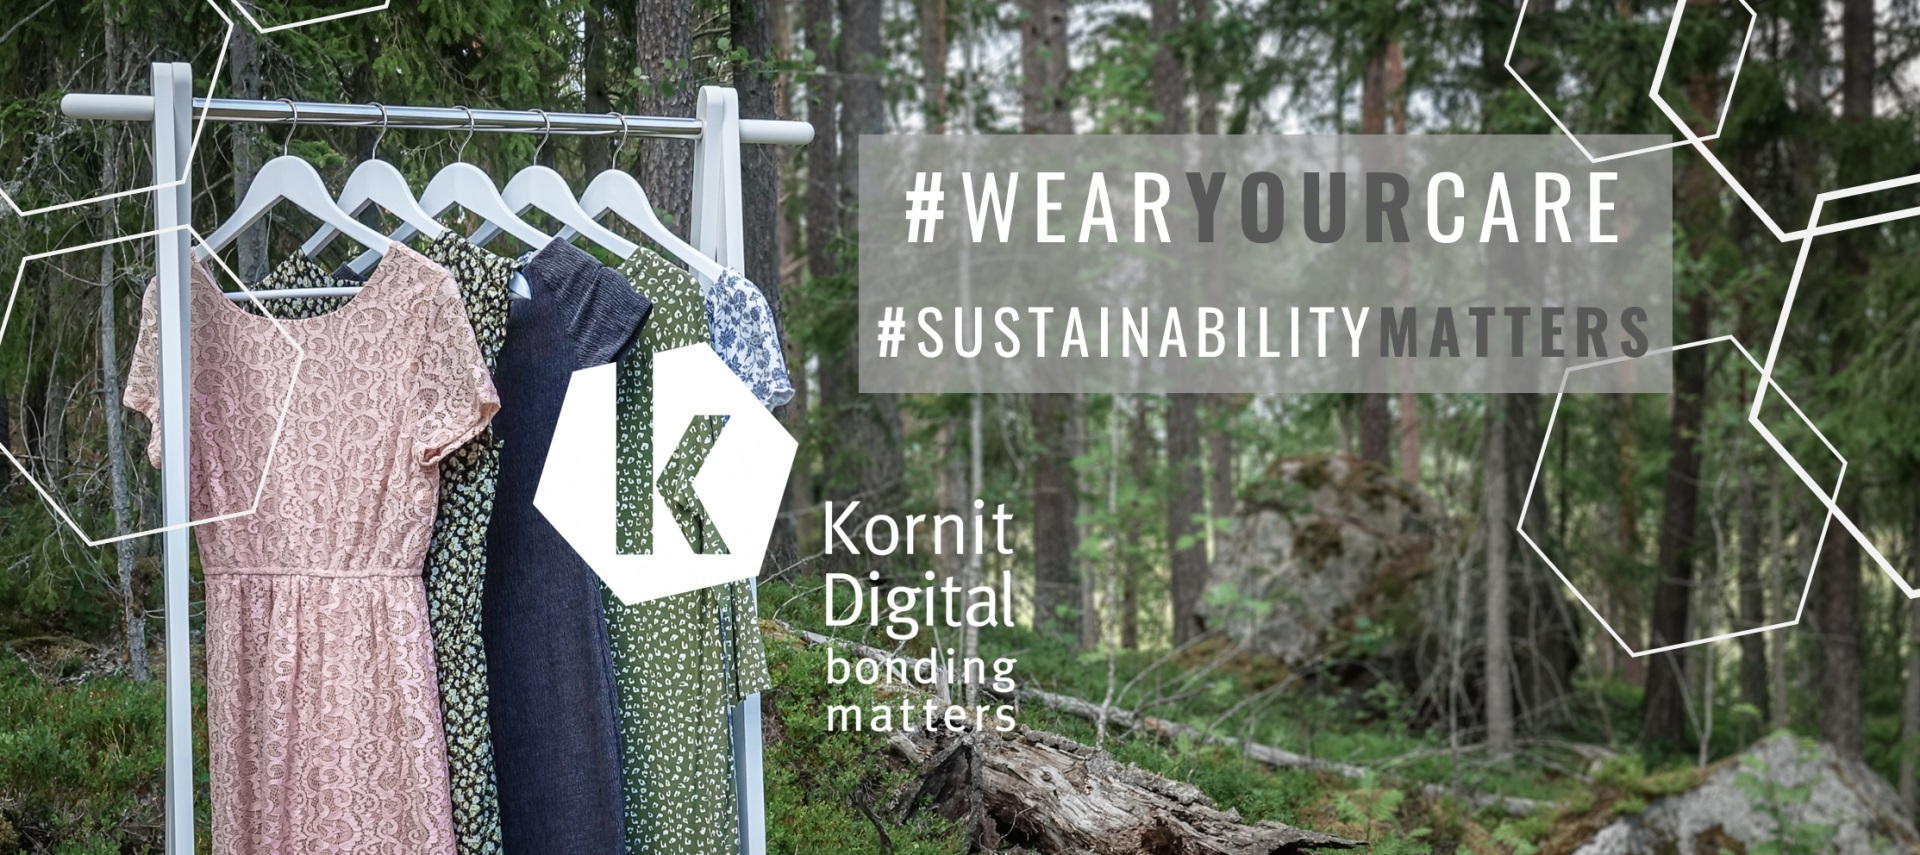 Kornit Sustainability Report